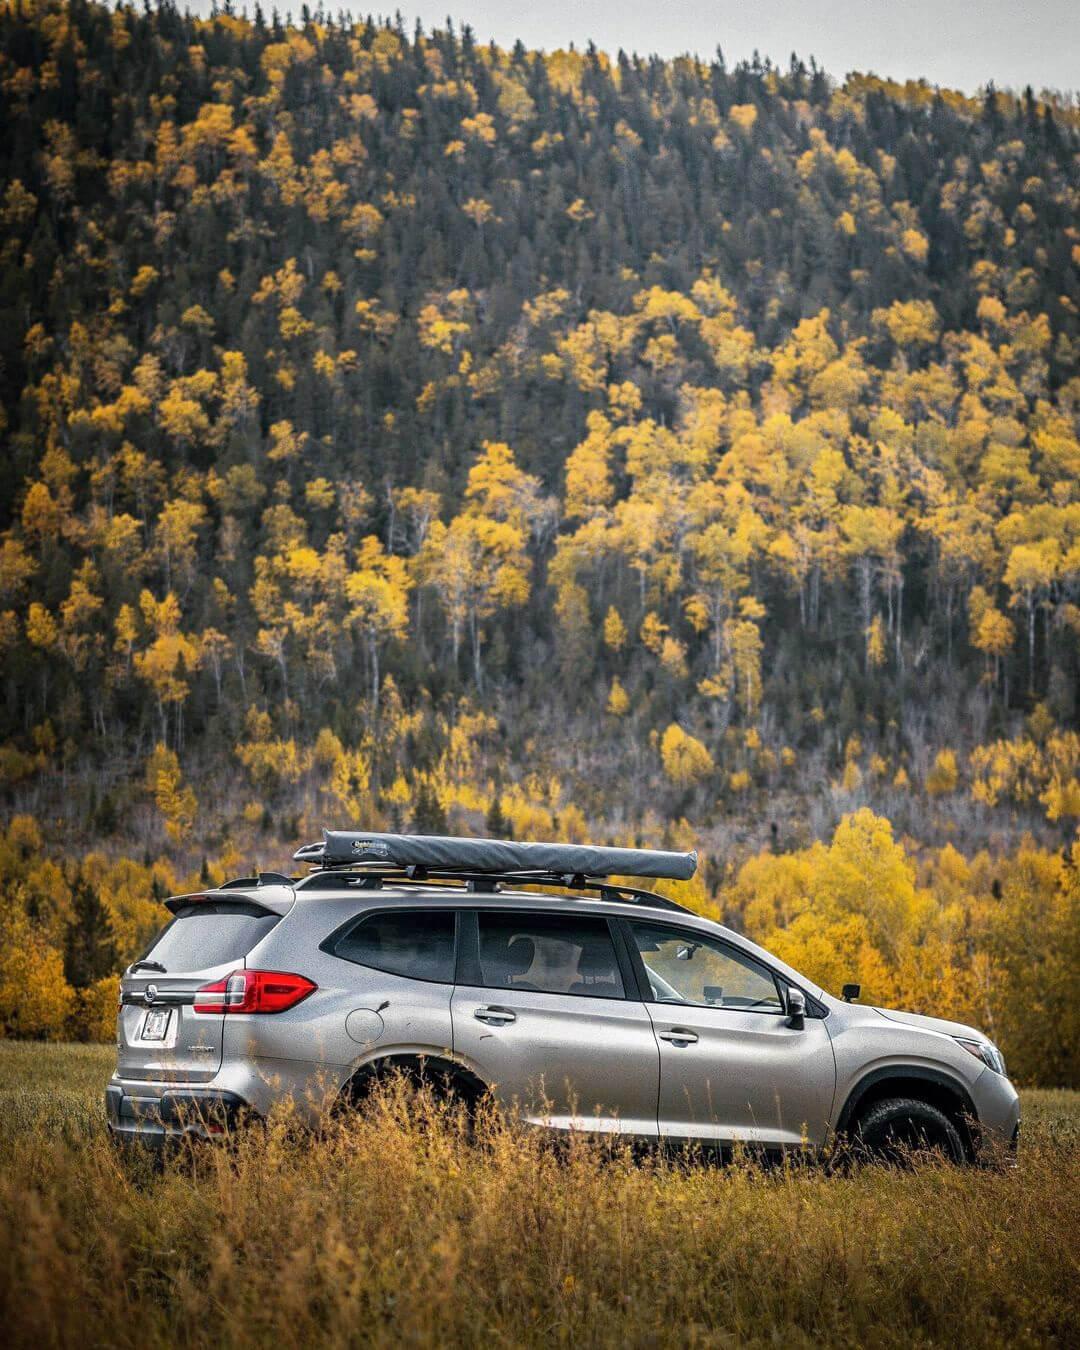 Dobinsons USA Medium Awning On Subaru Ascent